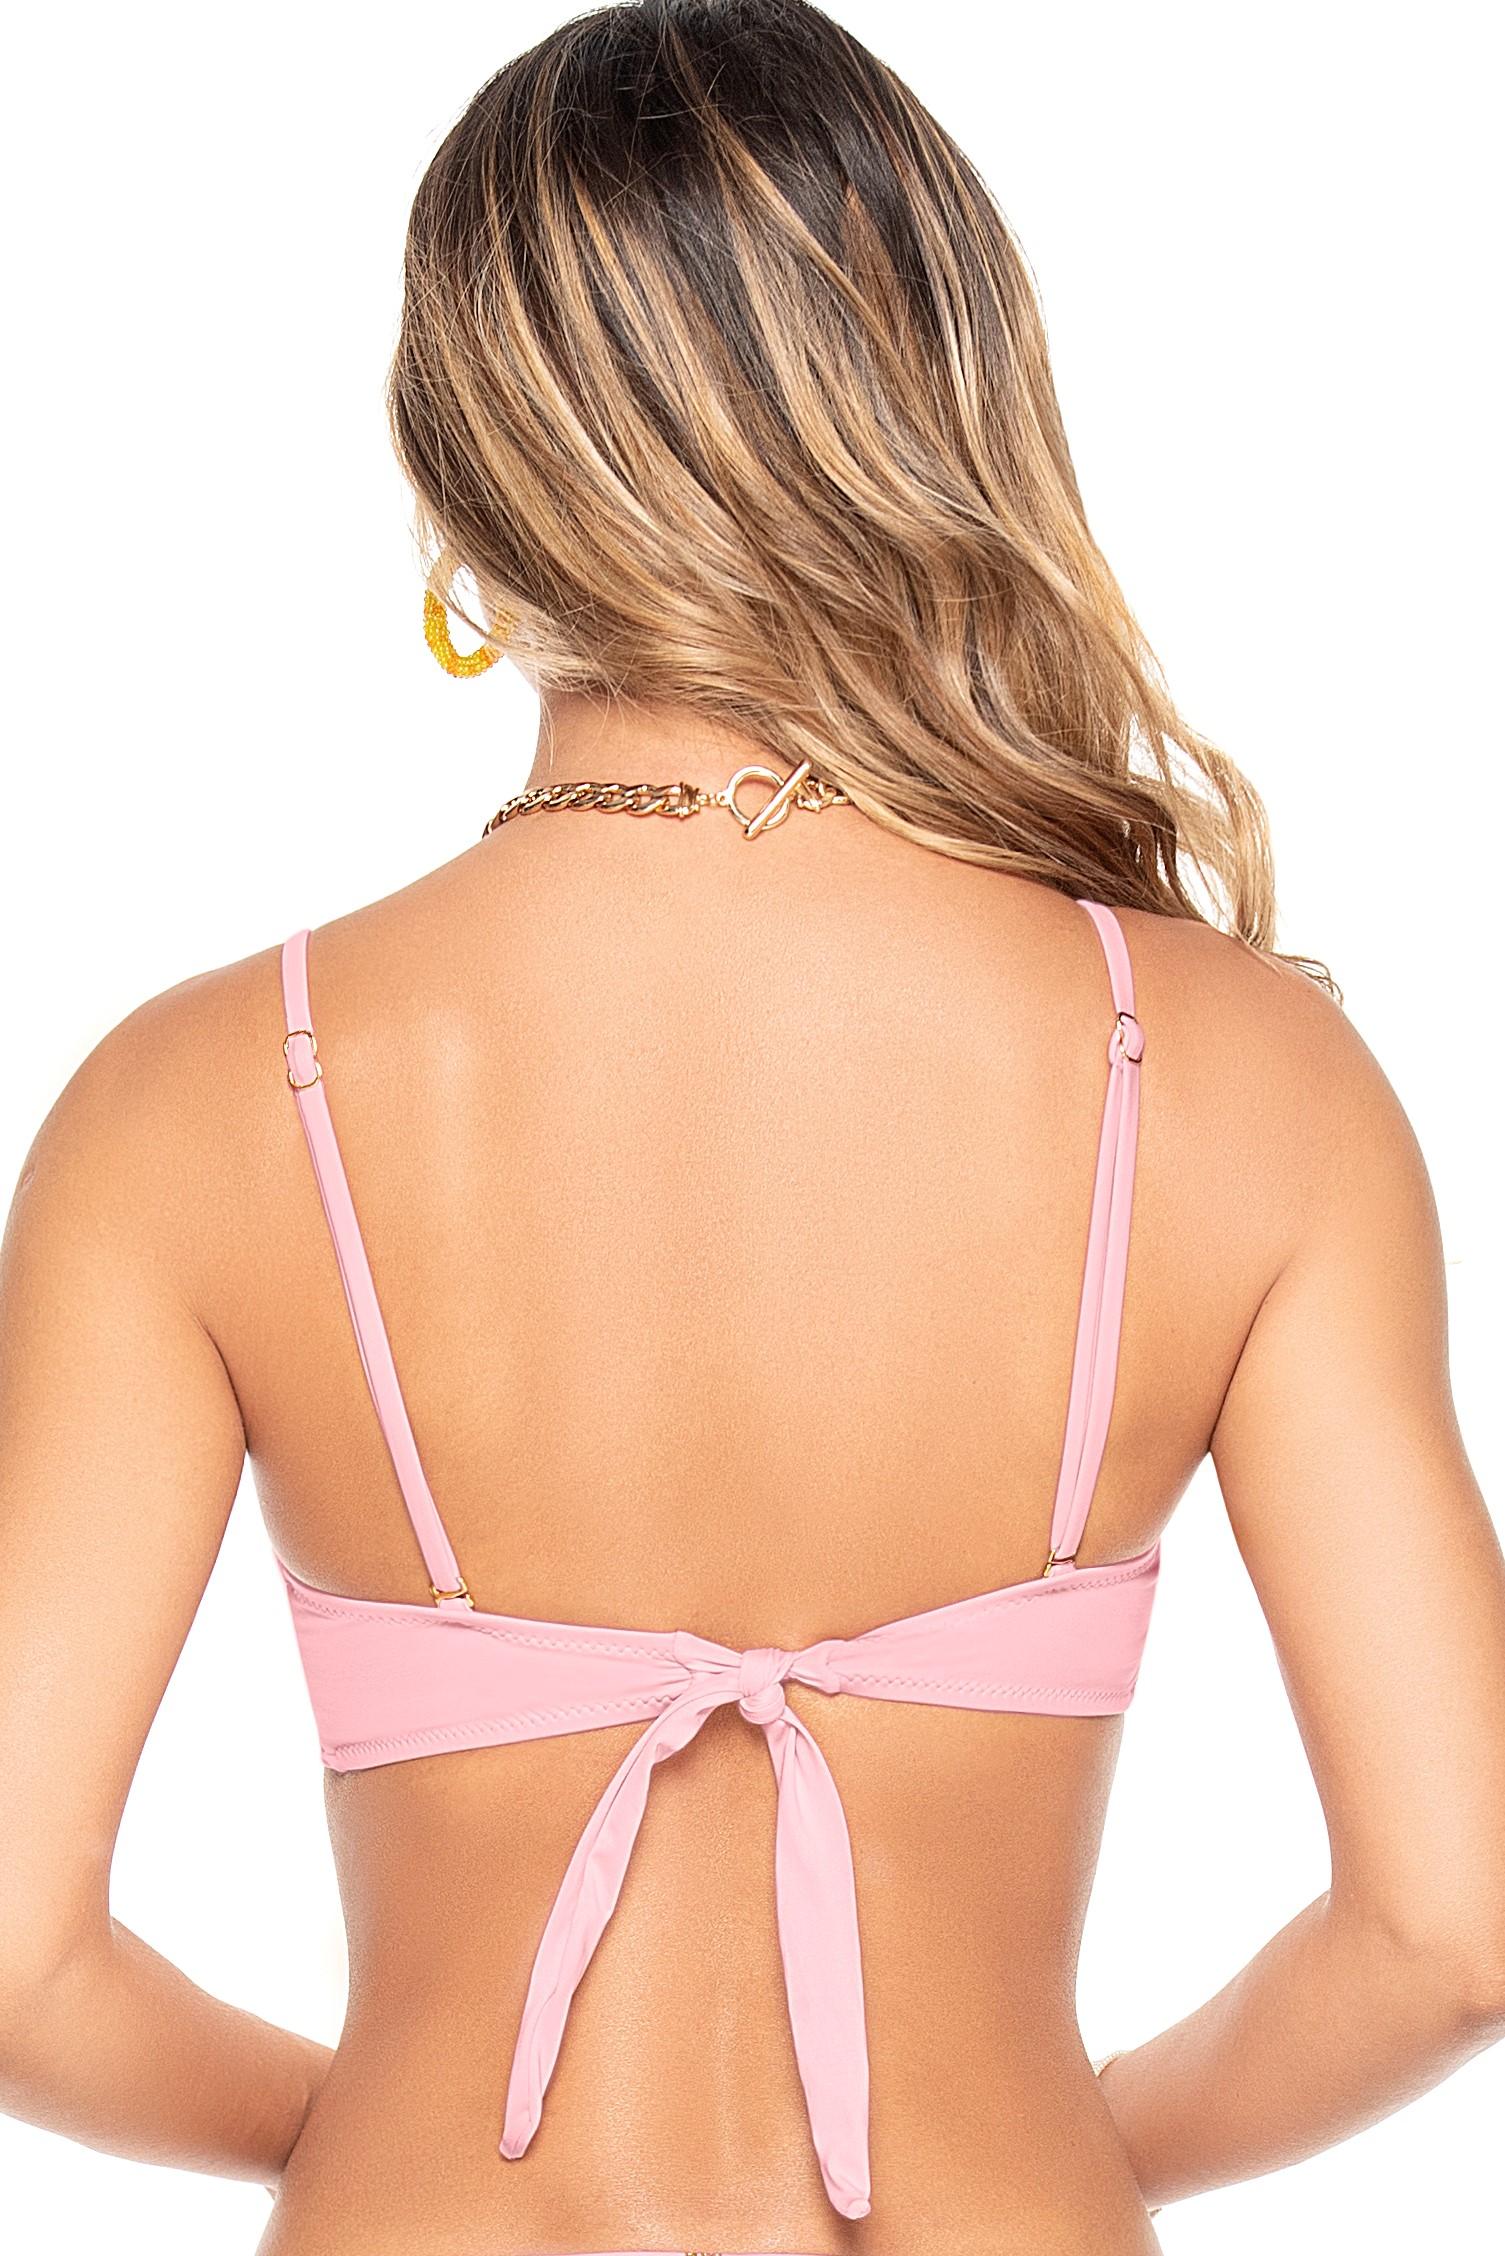 Phax Macarons Triangle Bikini -large-Roos